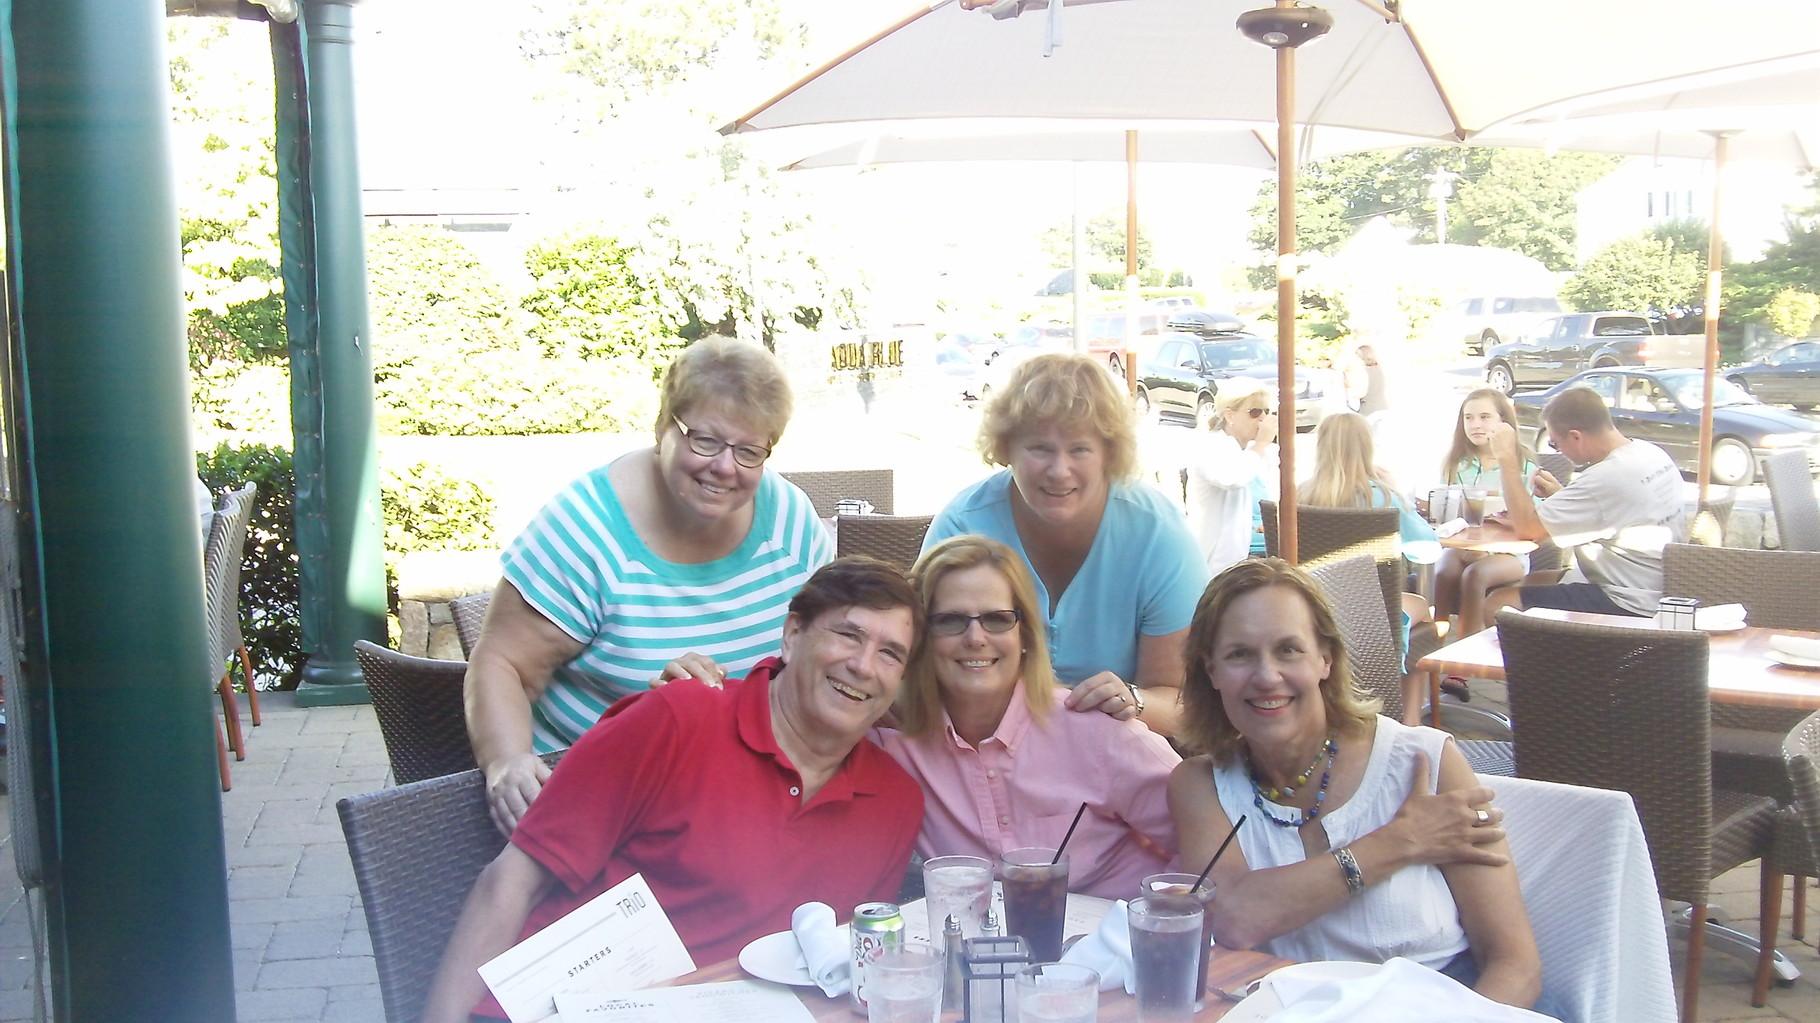 Margaret, John, Carol, Jane & Lorraine   The Cousins at Narragansett, Aug. 2015